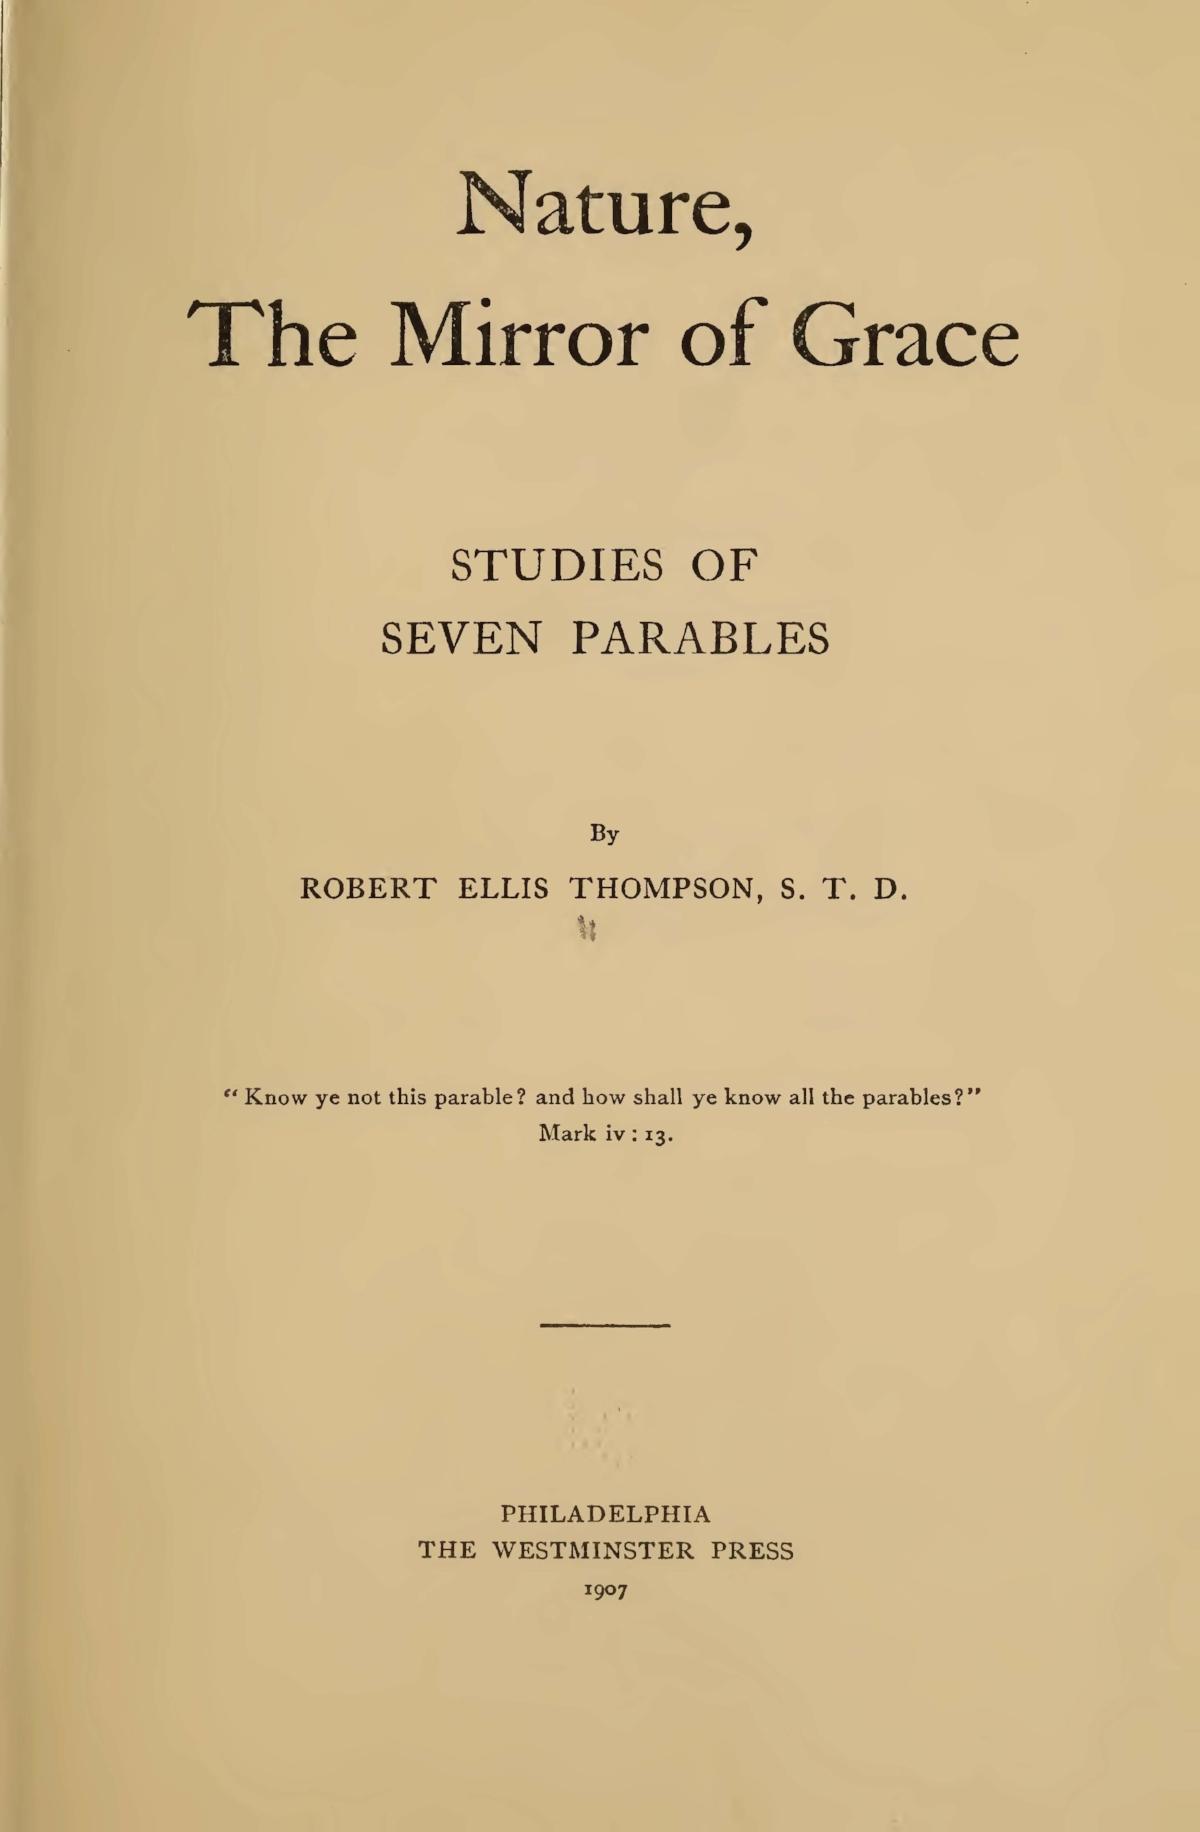 Thompson, Robert Ellis, Nature, the Mirror of Grace Studies of Seven Parables Title Page.jpg